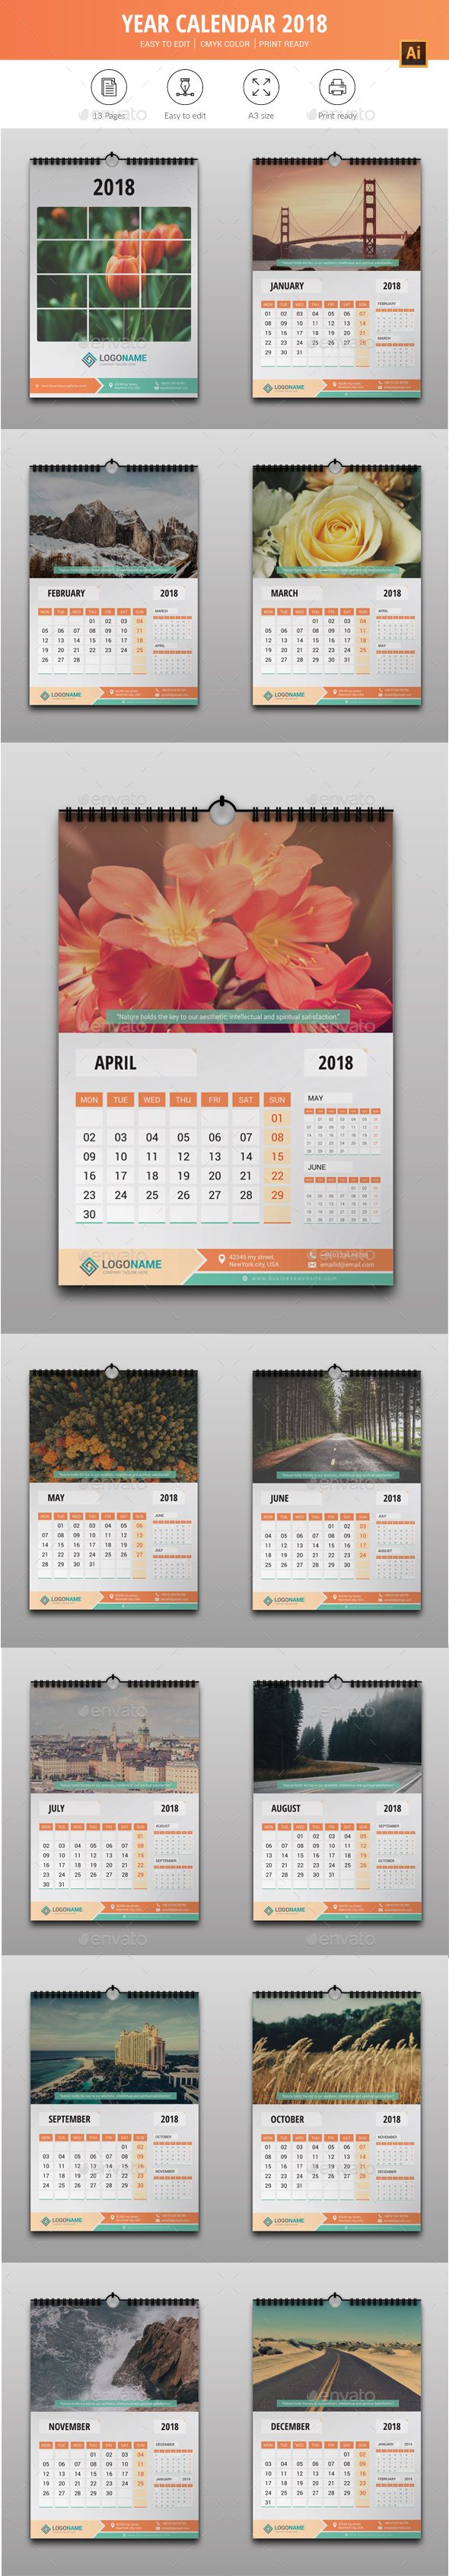 Year Calendar 2018 - #Calendars #Stationery